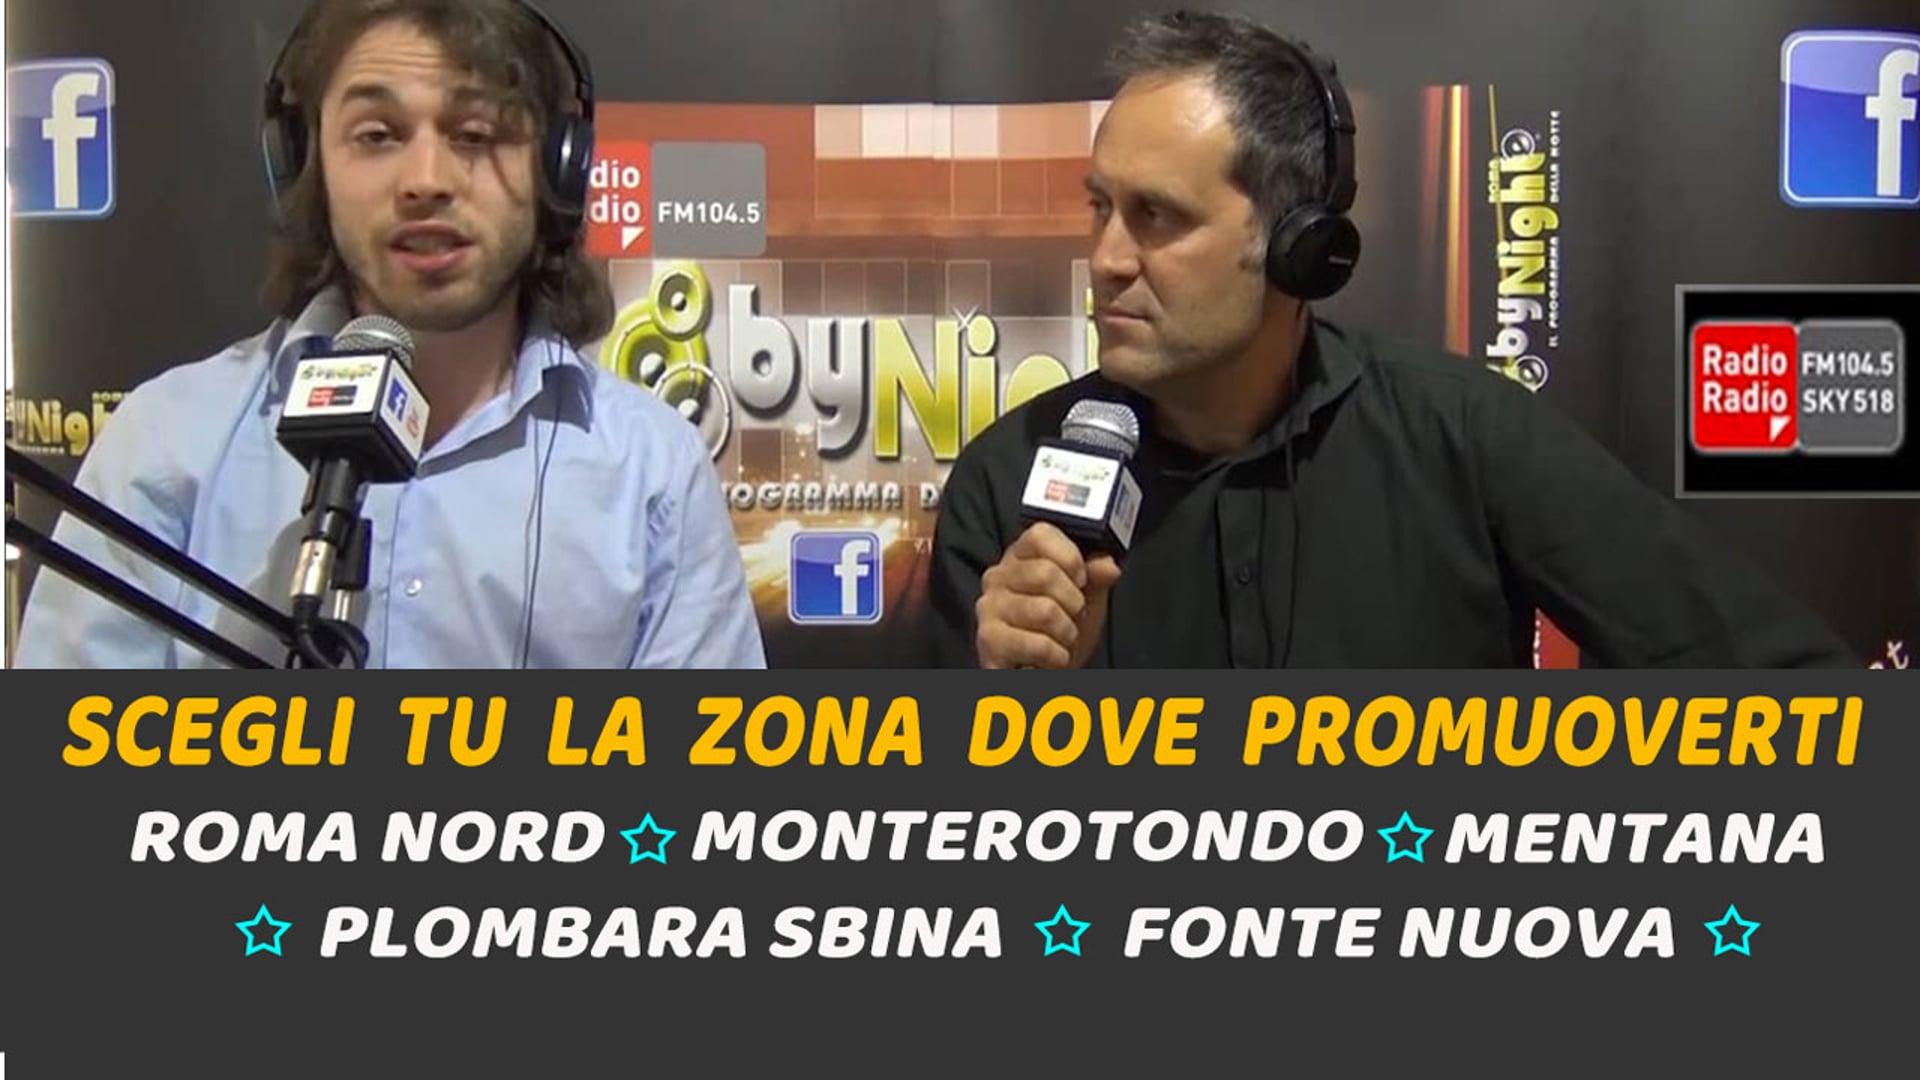 INTERVISTA A RADIORADIO